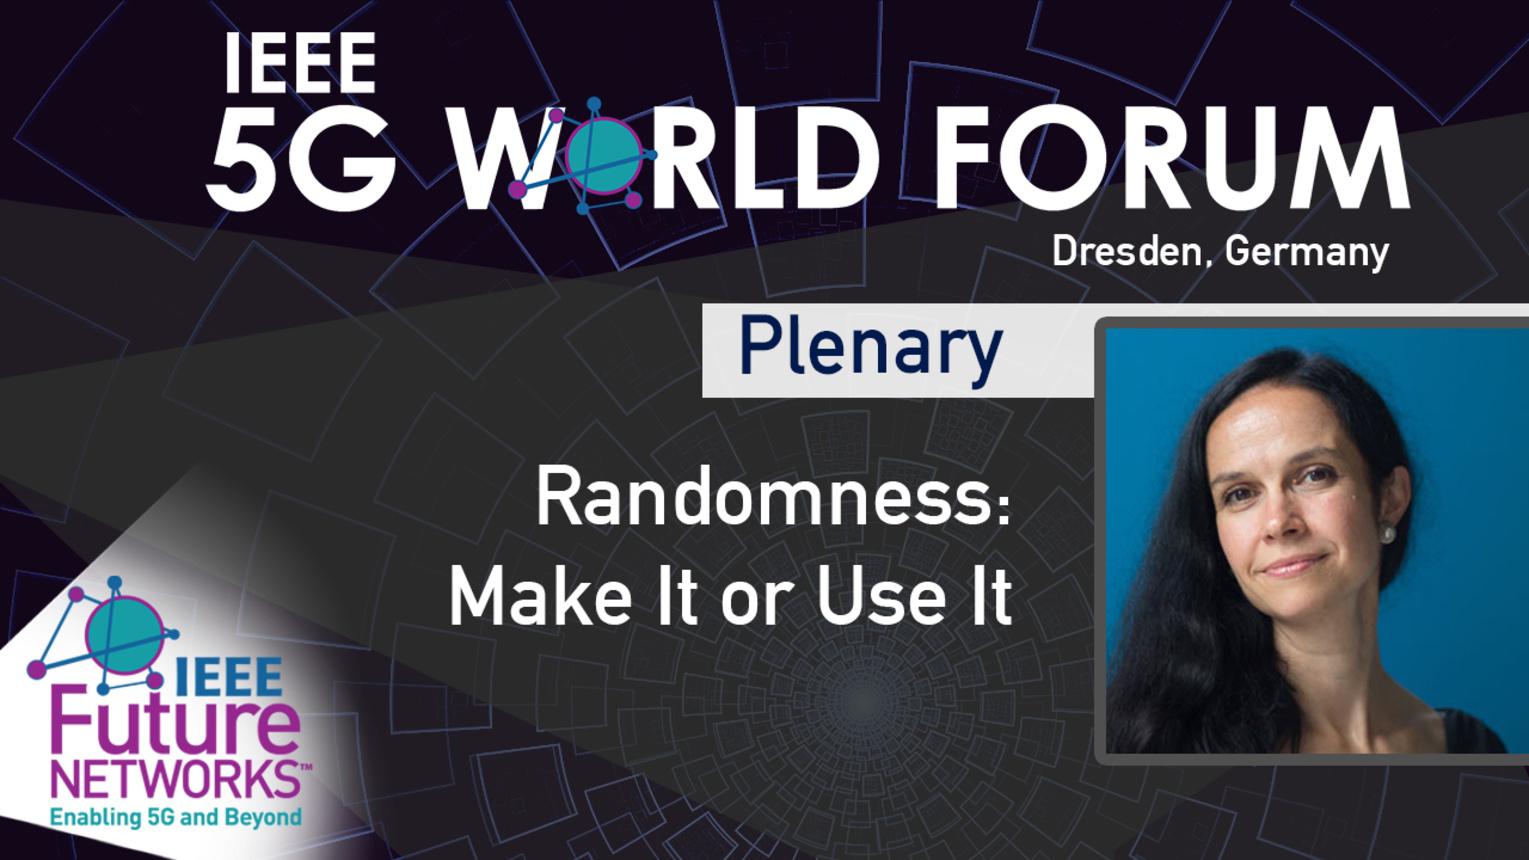 Randomness: Make It or Use It - Muriel Médard, 5G World Forum 2019